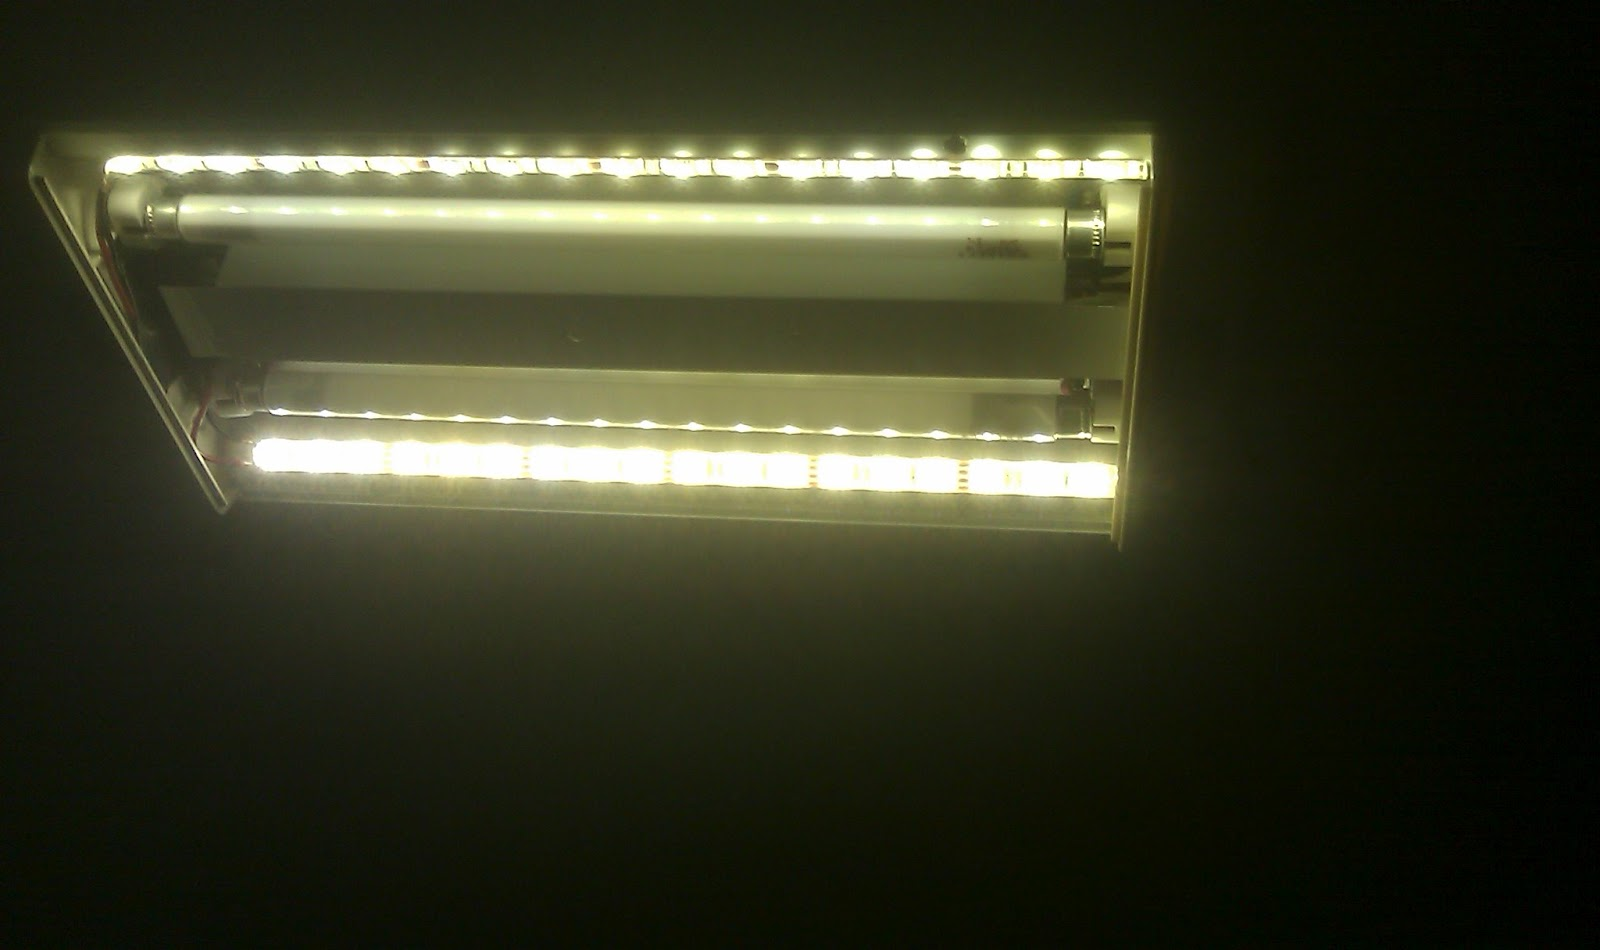 wanderman convert fluorescent lights to led dual use. Black Bedroom Furniture Sets. Home Design Ideas